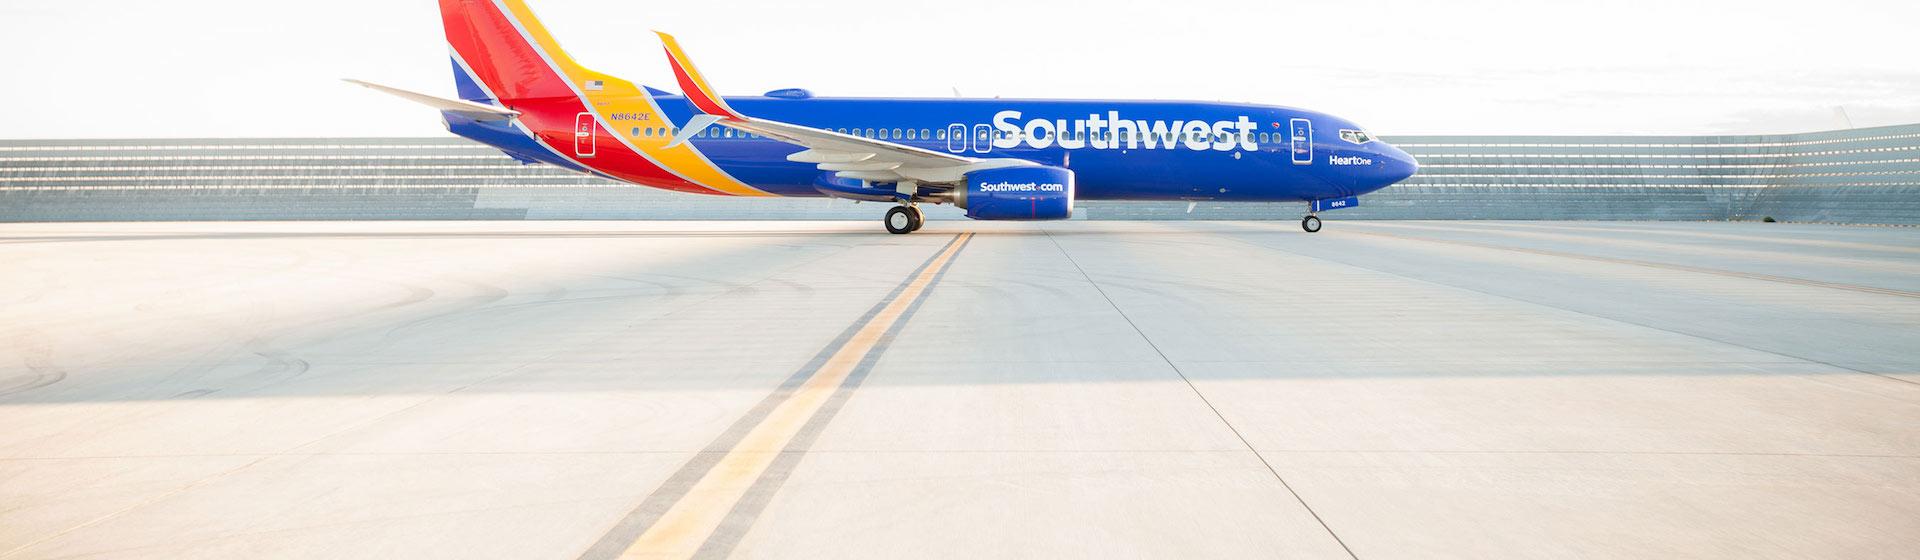 Southwest (WN) - Read Reviews & Book Flights - KAYAK